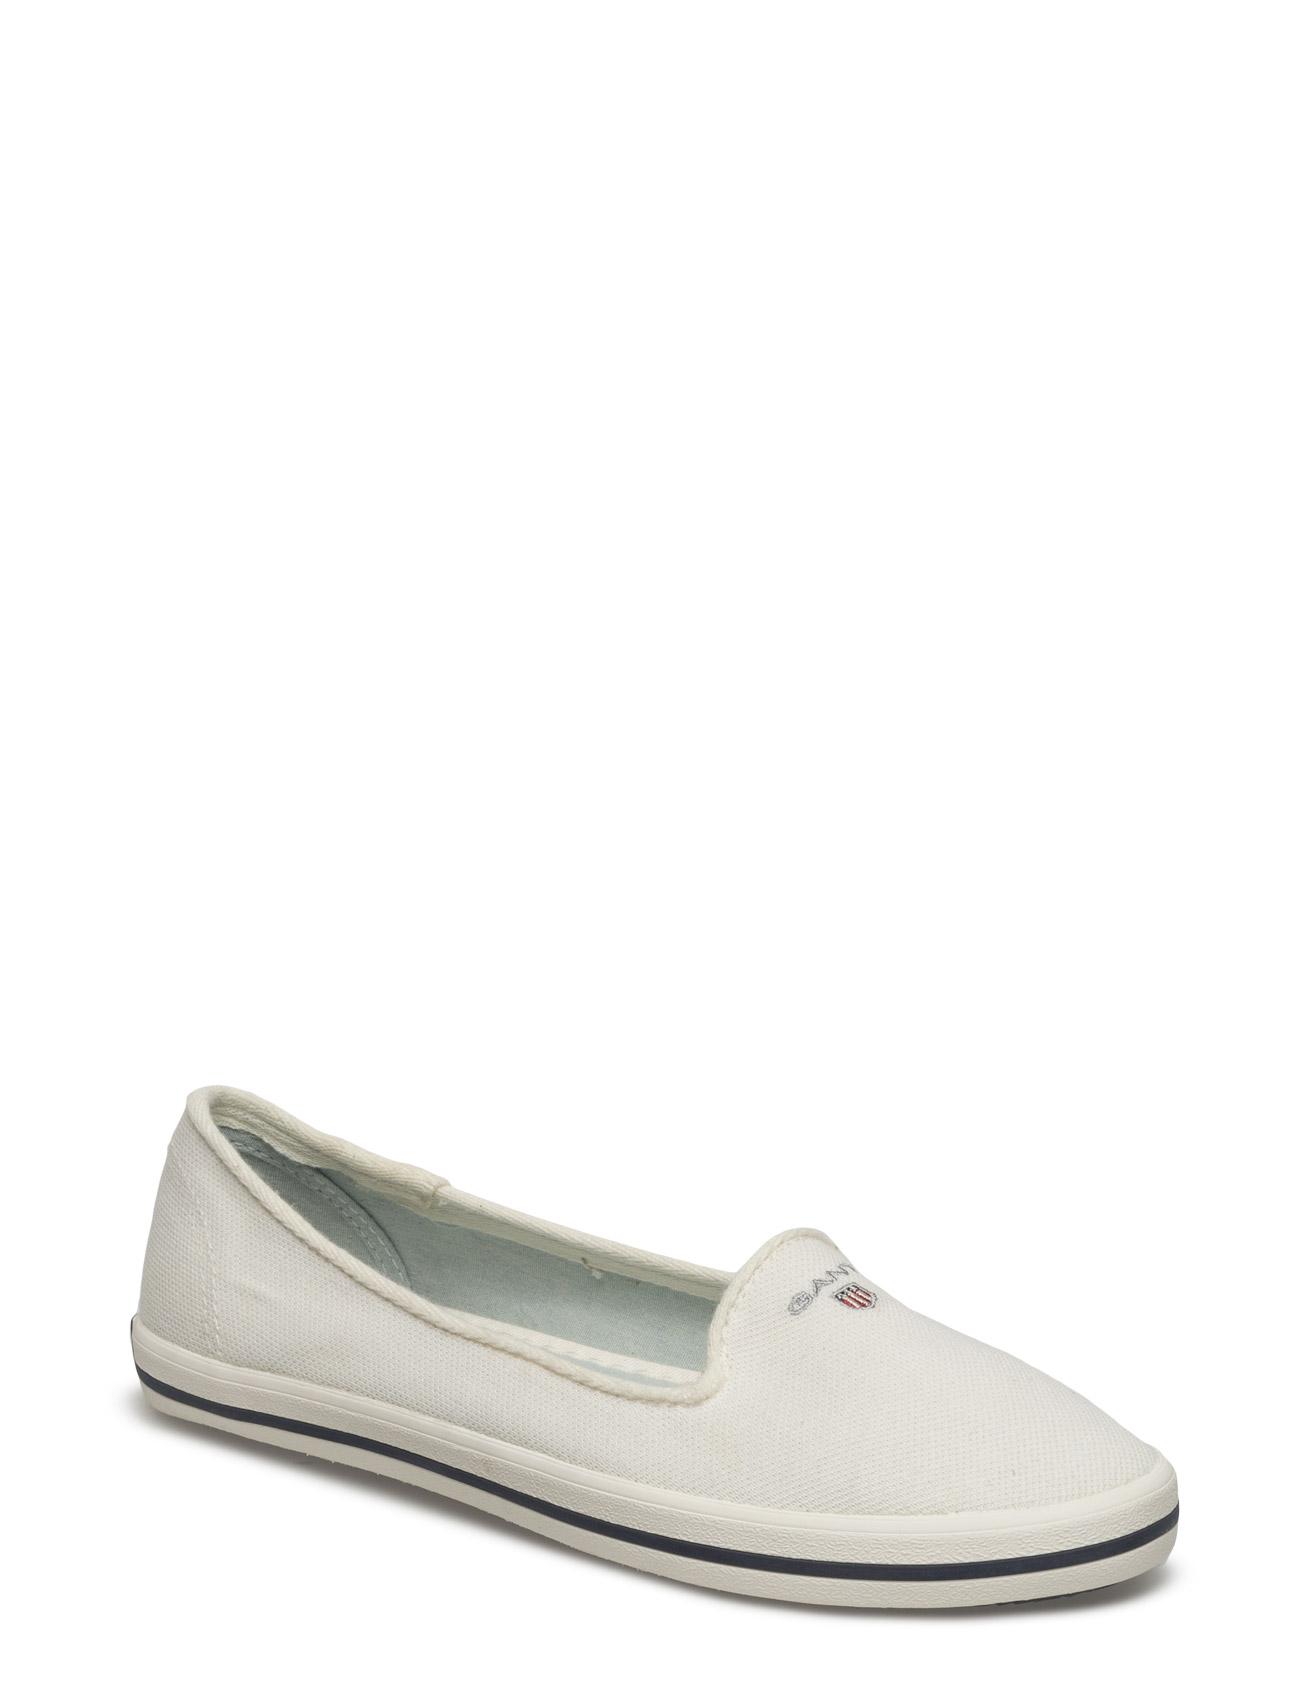 New Haven Slip-On Shoes GANT Sneakers til Damer i